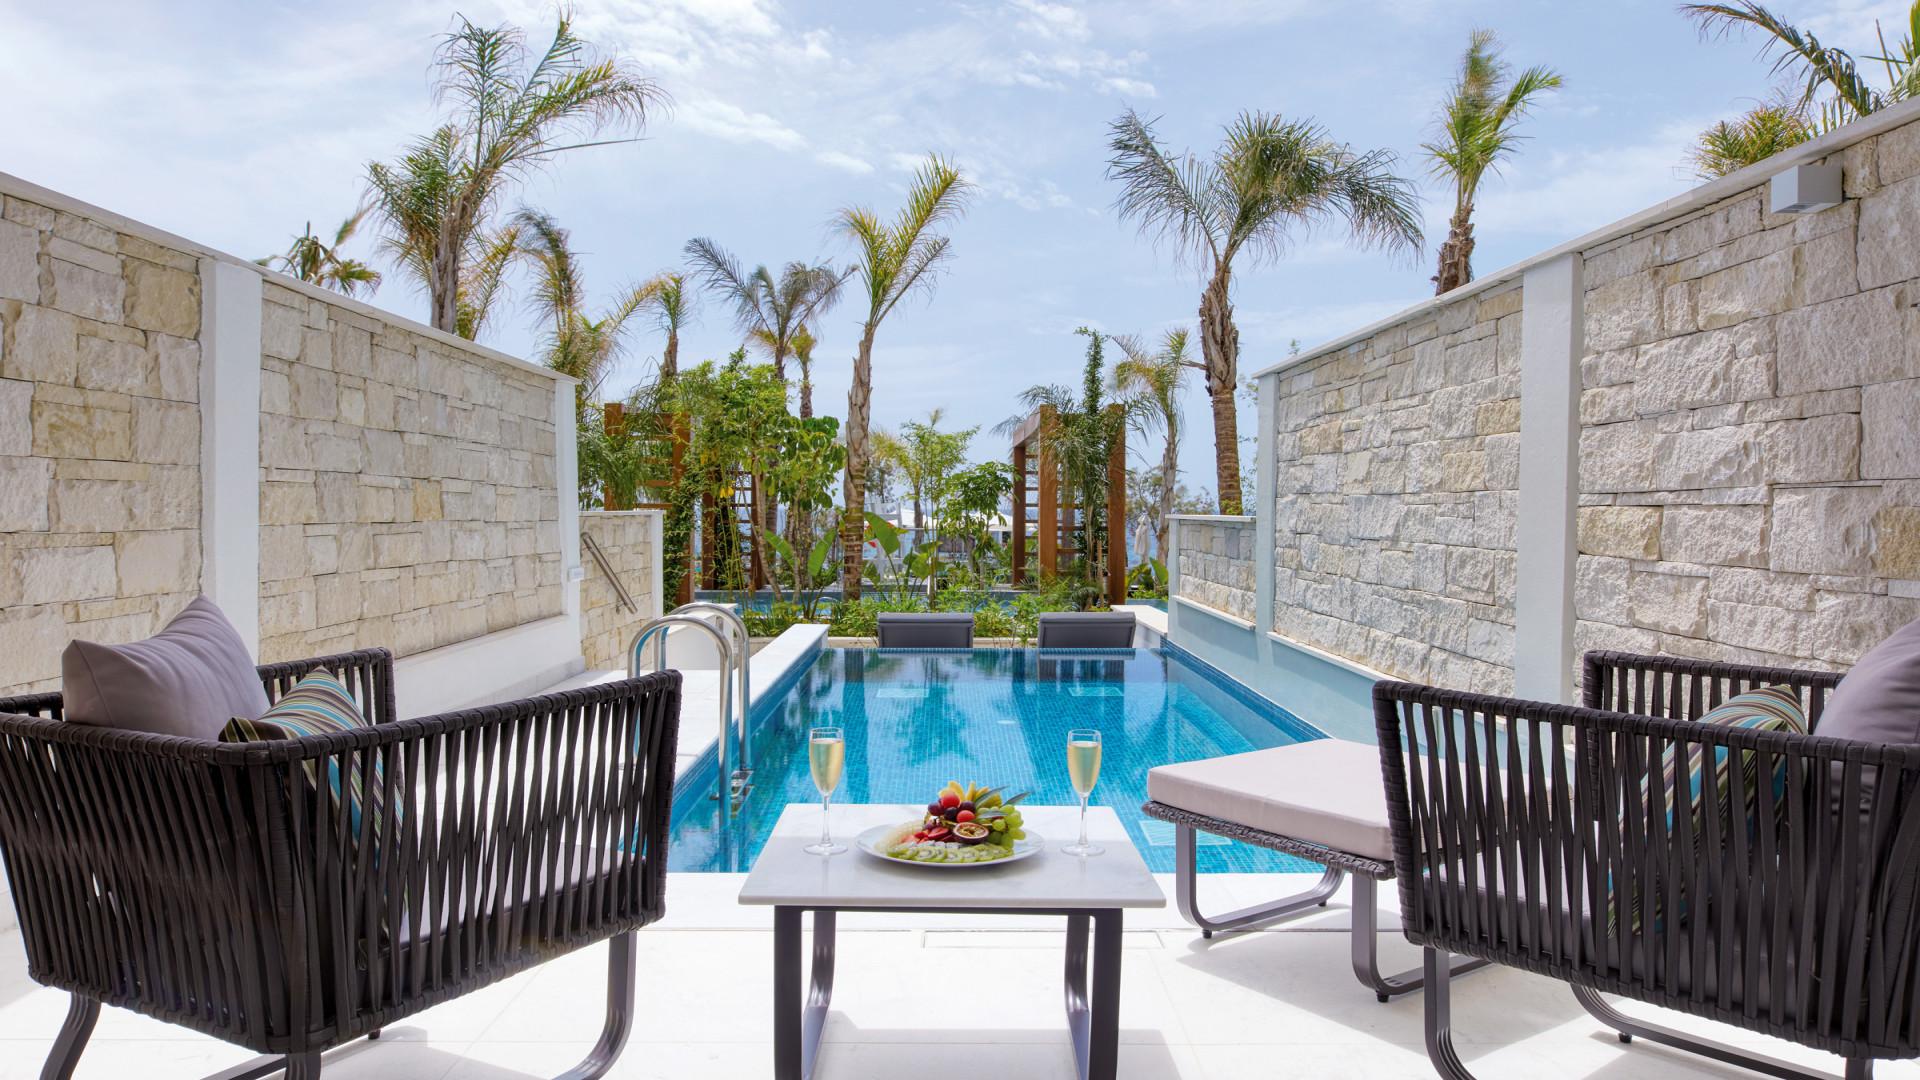 Privézwembad, Amavi hotel, Paphos, Cyprus